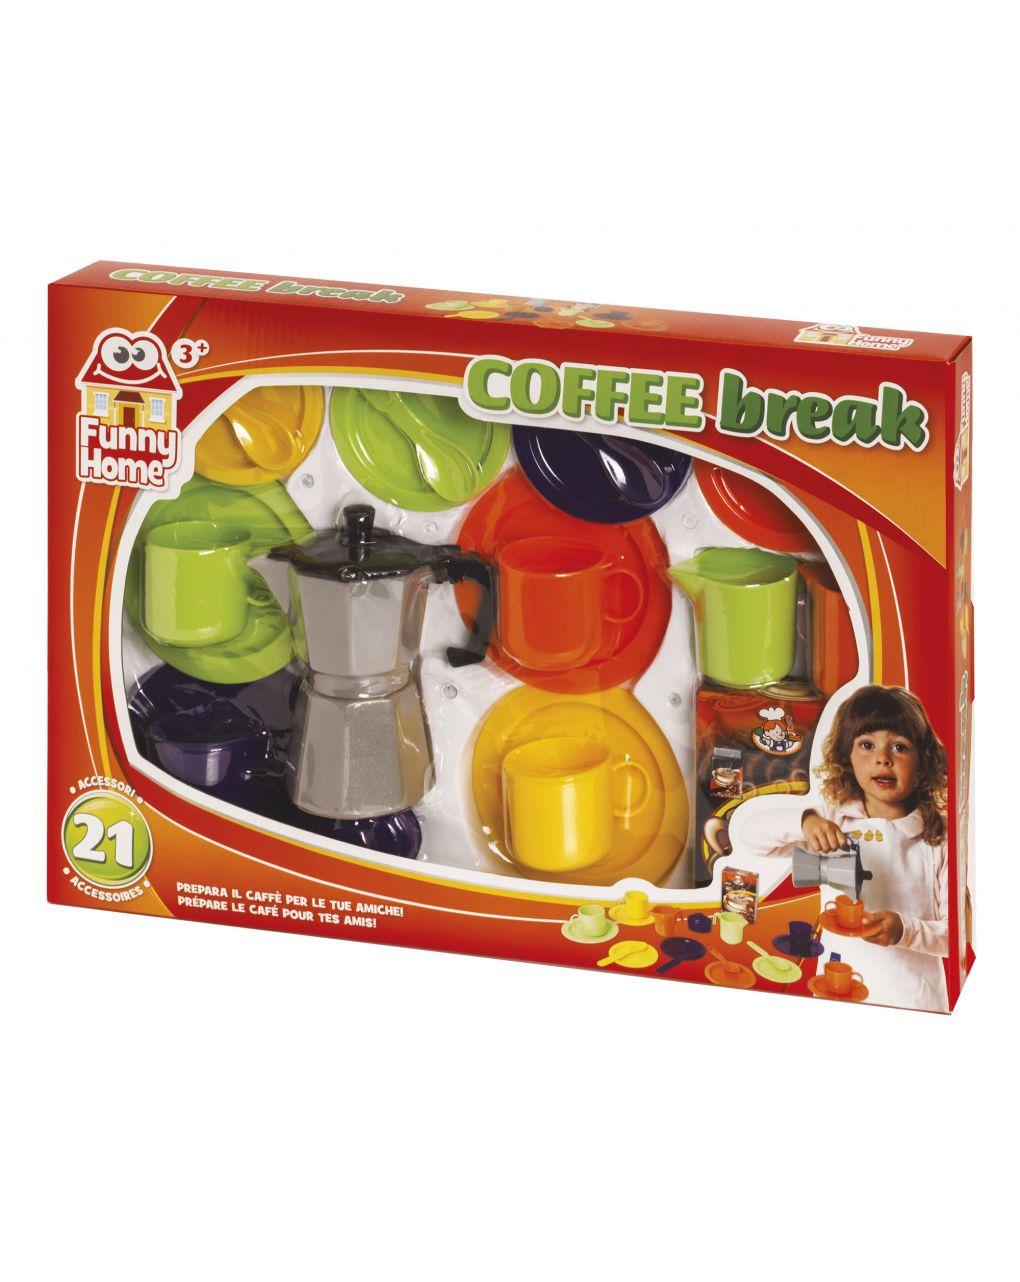 Funny home - set caffè 22 pz - FunnyHome